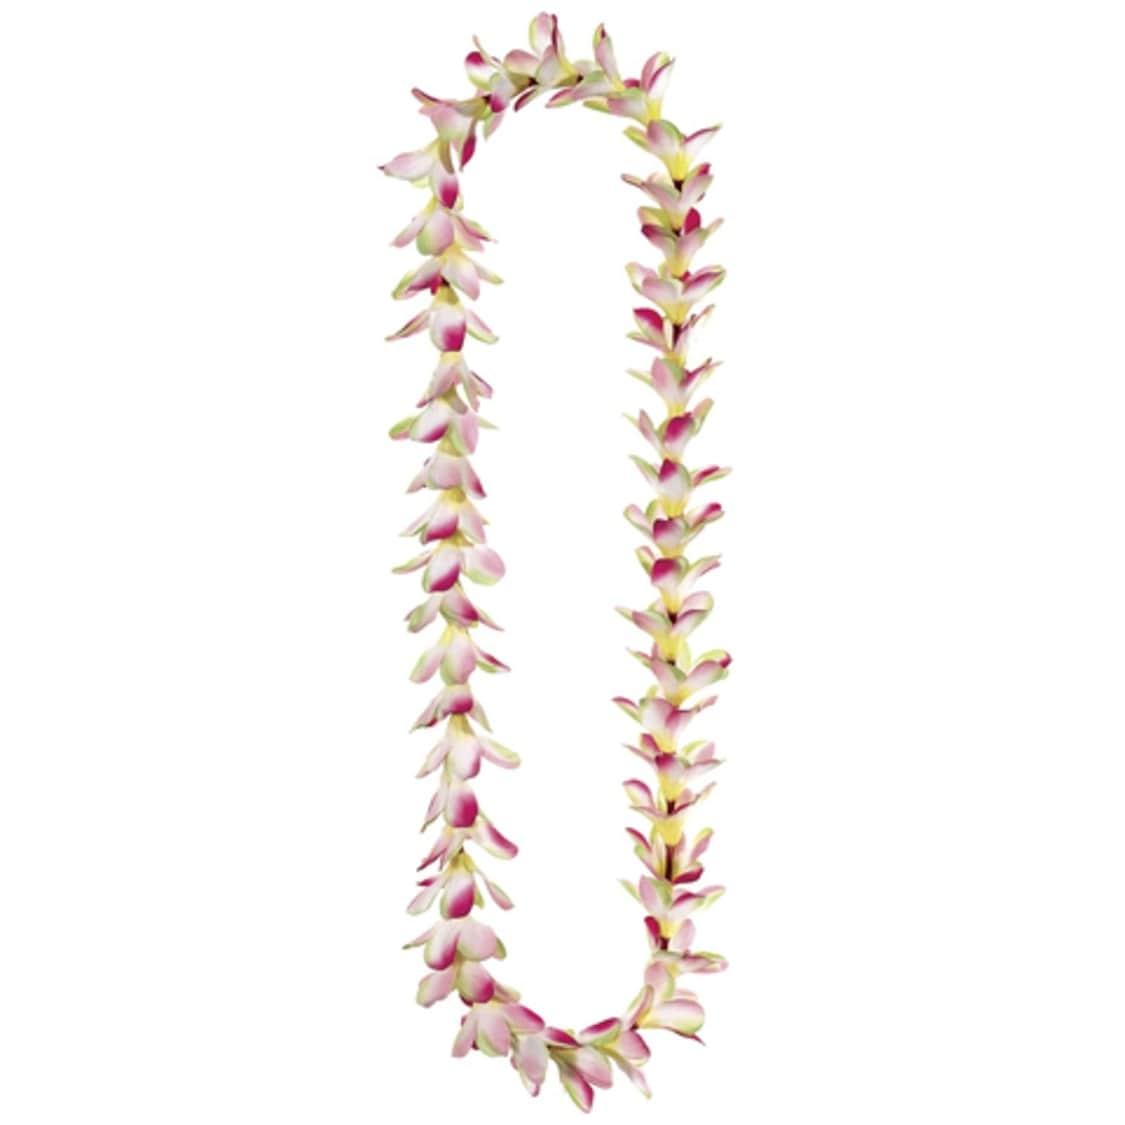 Shop Club Pack Of 24 Artificial Hot Pink Frangipani Silk Flower Leis